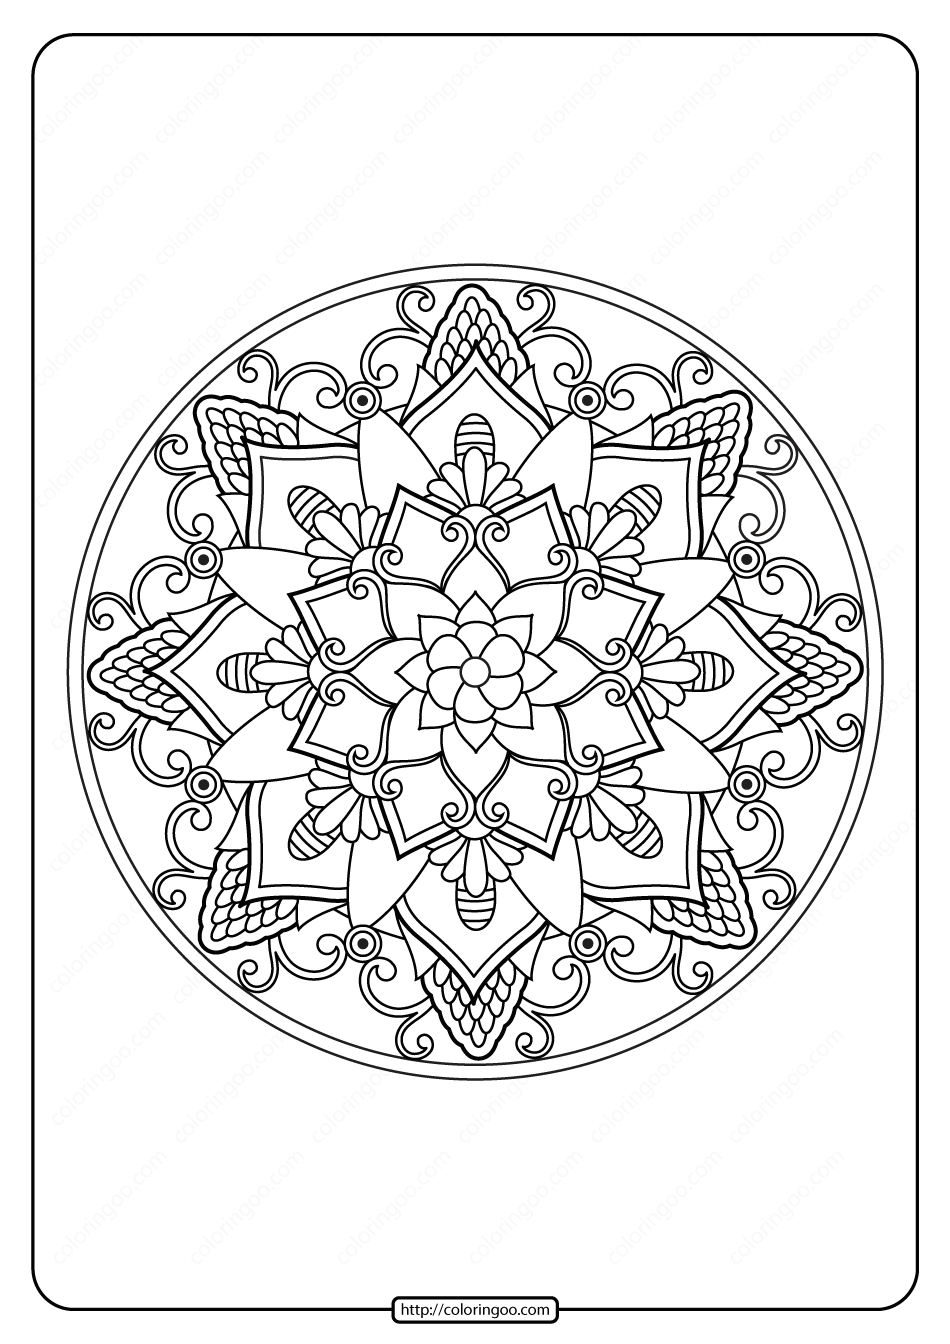 Free Printable Adult Floral Mandala Coloring Page 66